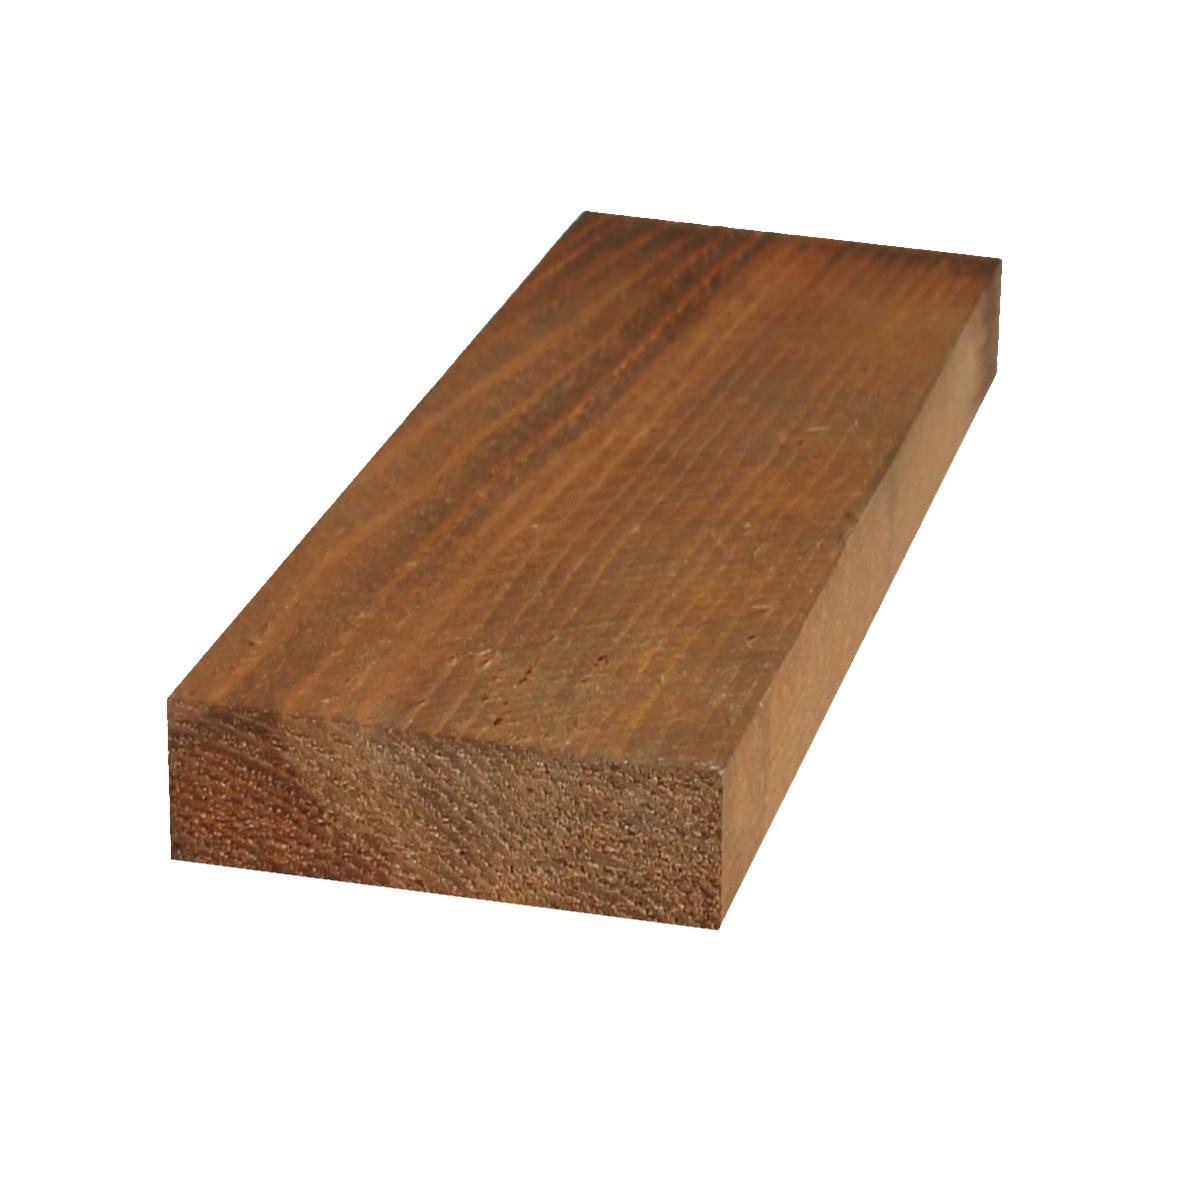 Tavola Abete Grezza Impregnata Spessore 25 Mm Wood4you